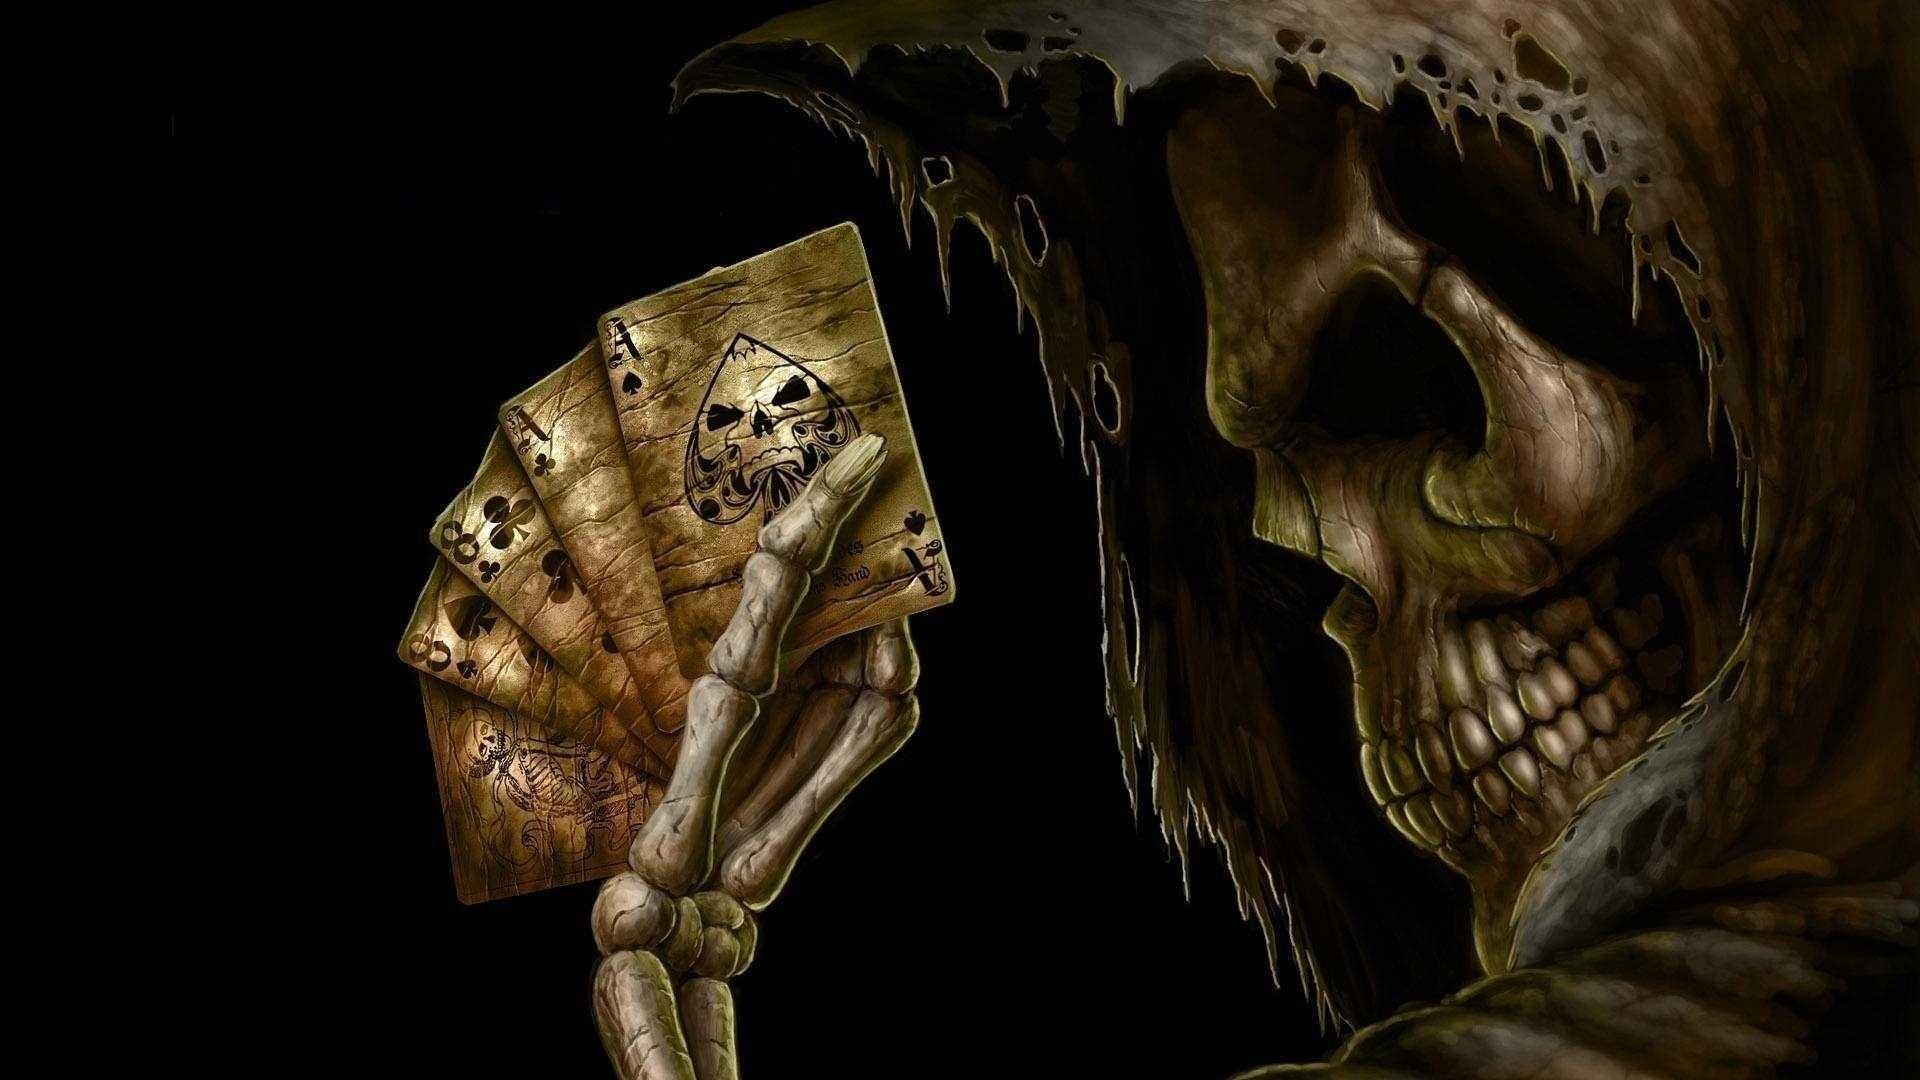 Best Wallpaper High Quality Horror - 1008559-full-size-scary-hd-wallpaper-1920x1080-full-hd  Snapshot_5925100.jpg